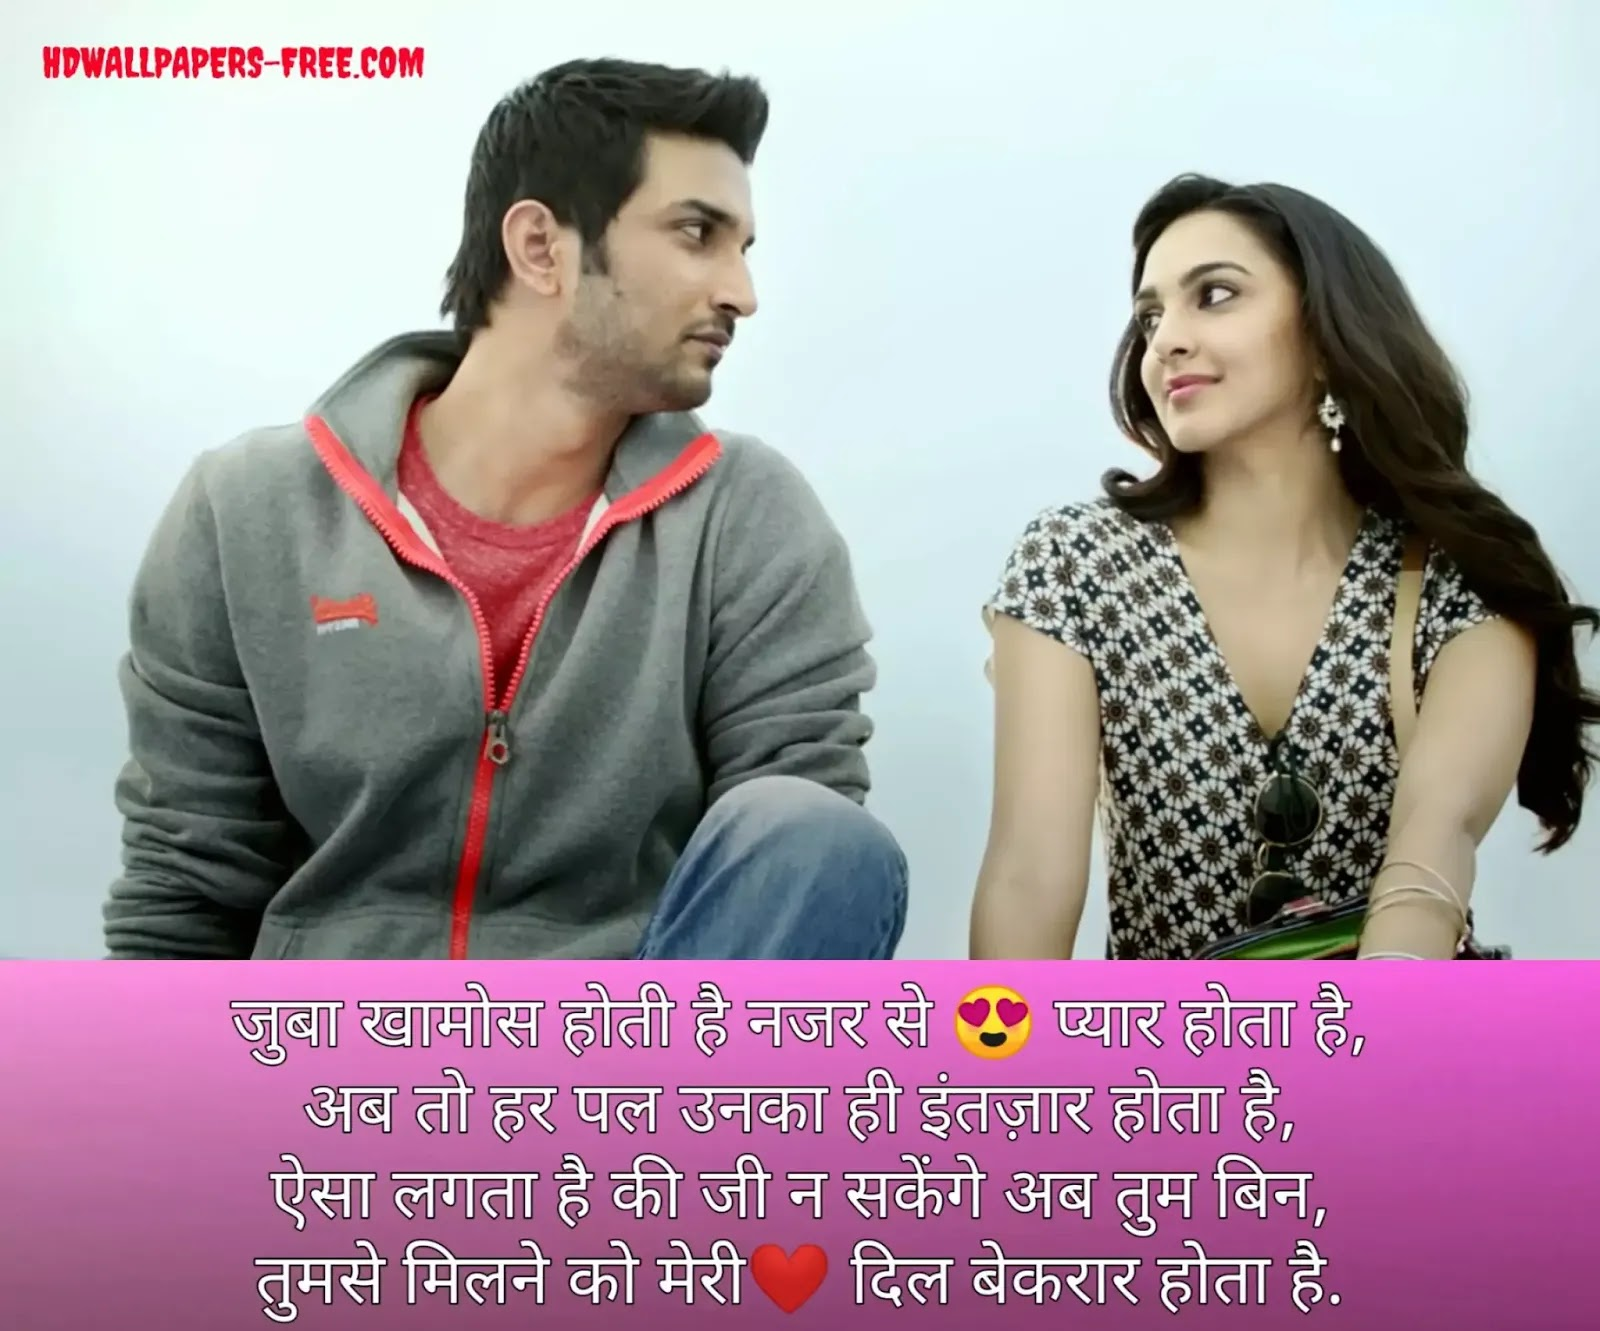 Love Couple Shayari With Image Photo Download Full HD